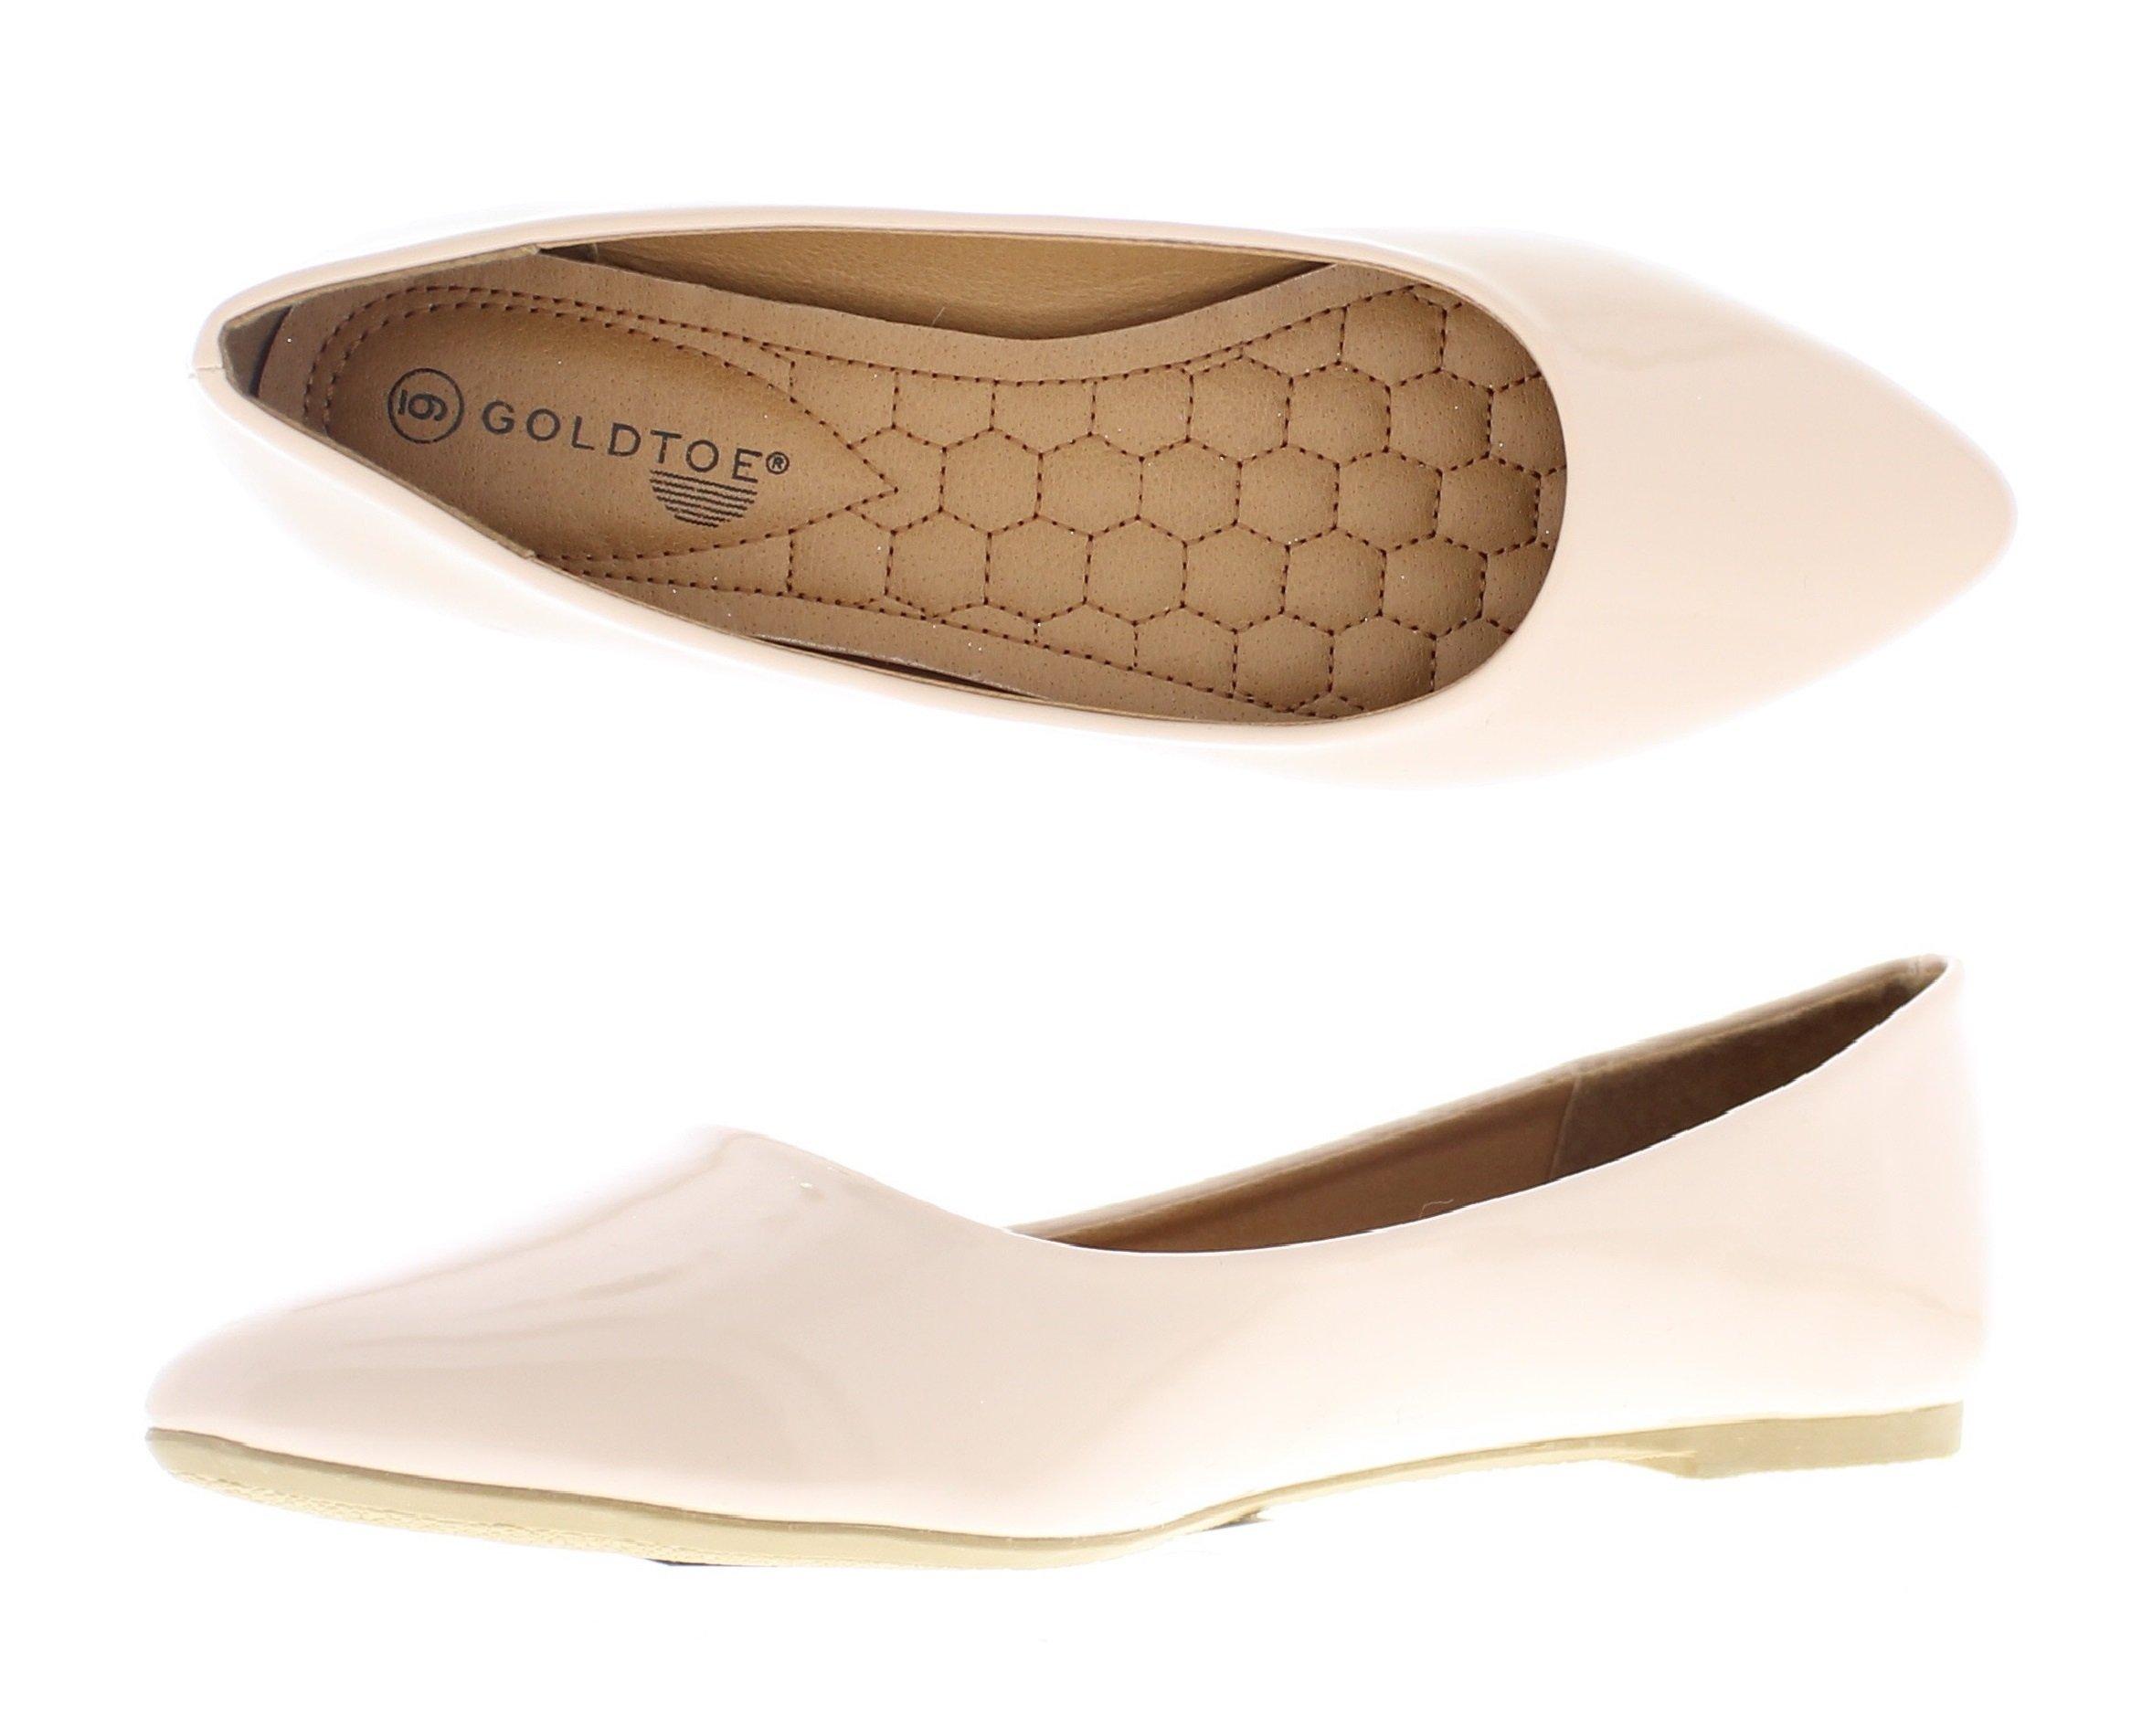 Gold Toe Women's Casima Faux Patent Leather Slip On Pointed Toe Ballet Flat Dress Pump Memory Foam Shoes Nude 6 US